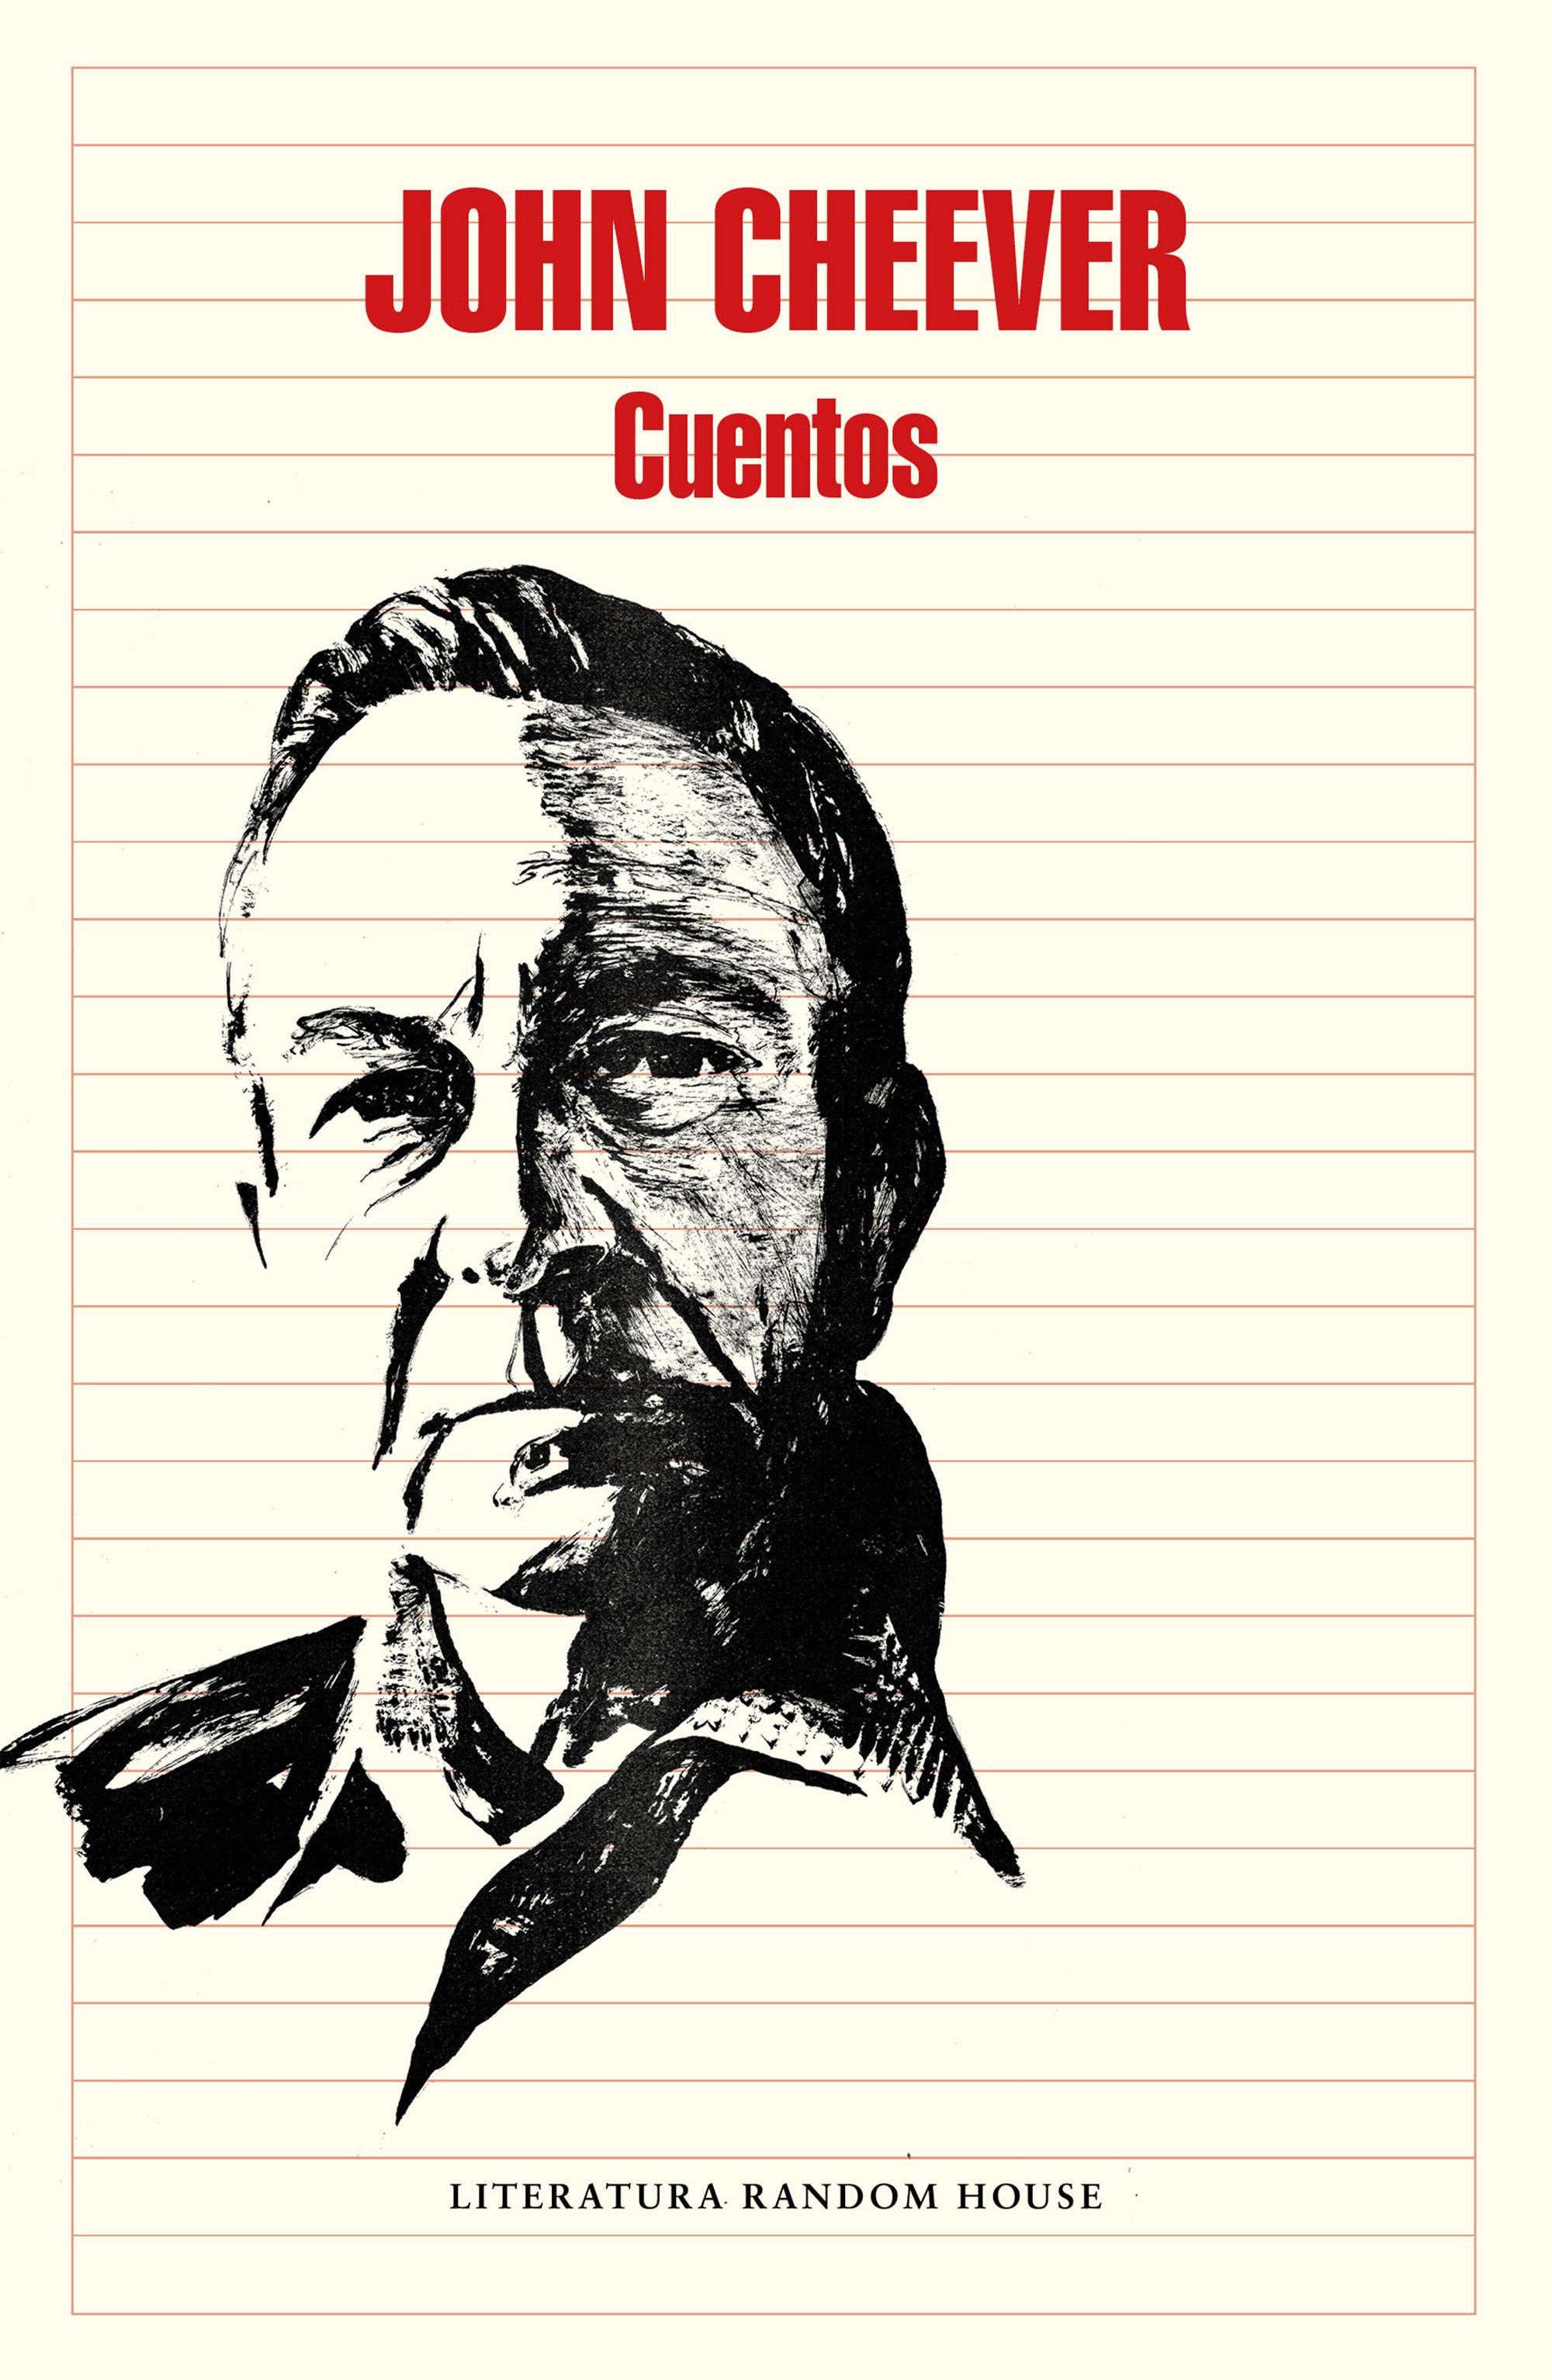 Cuentos - John Cheever - Literatura Random House